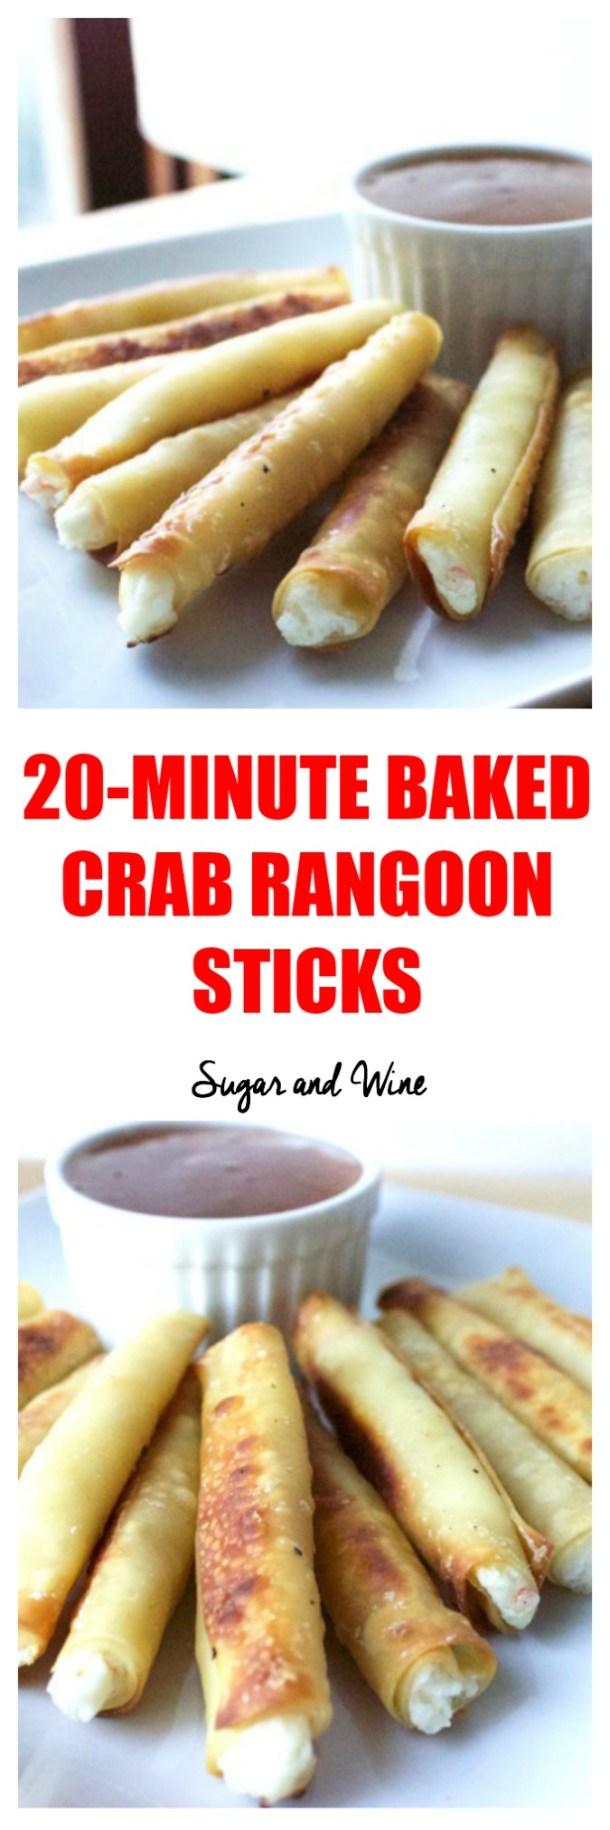 20 Minute Baked Crab Rangoon Sticks   Sugar and Wine